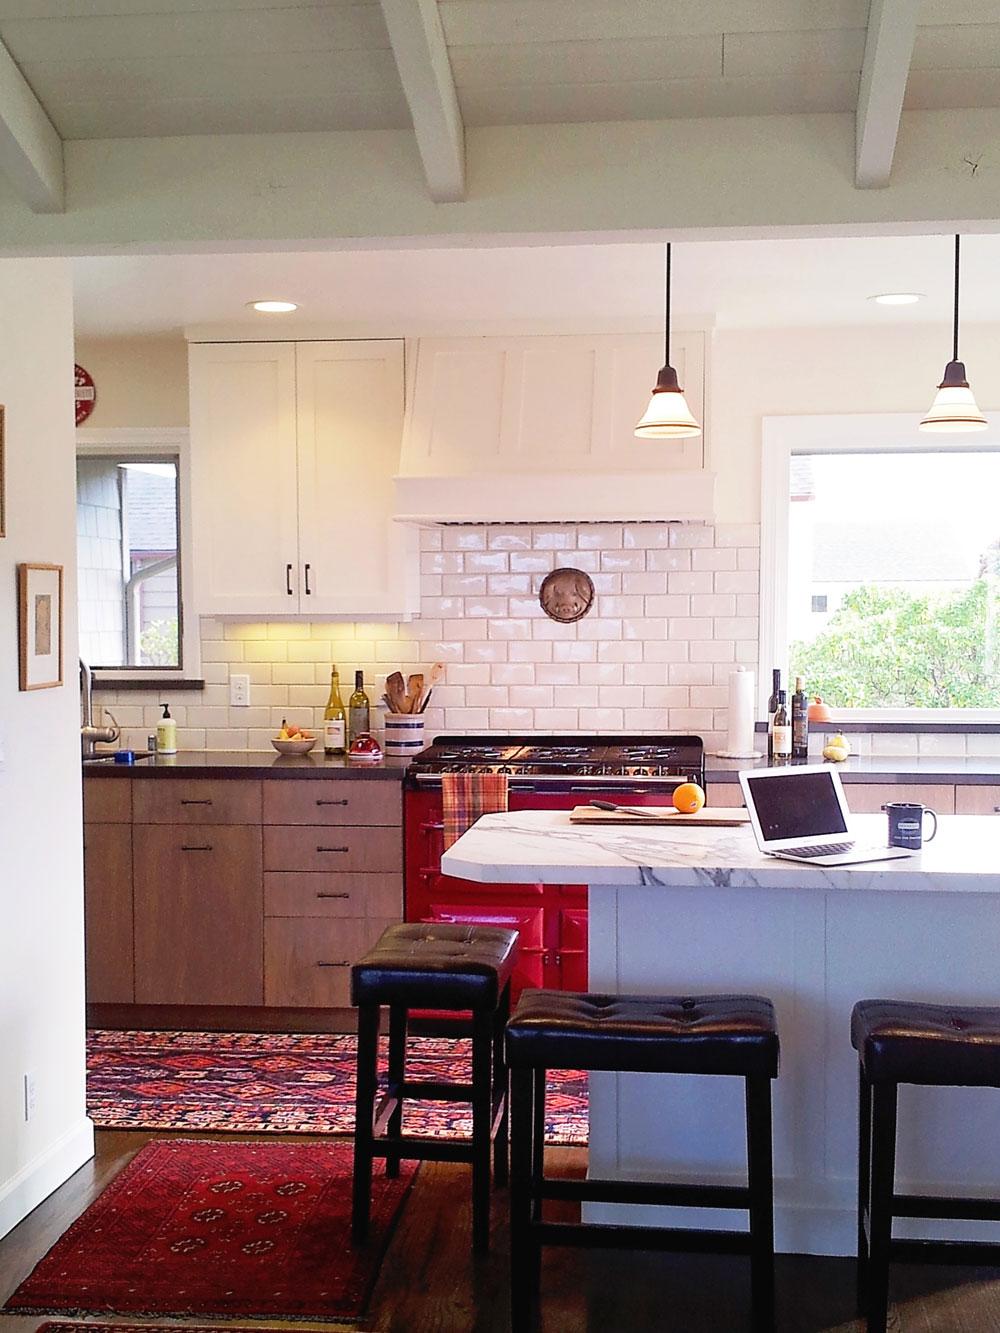 2-kitchen-beamed-ceiling-island-open-concept-dee-carawan.jpg